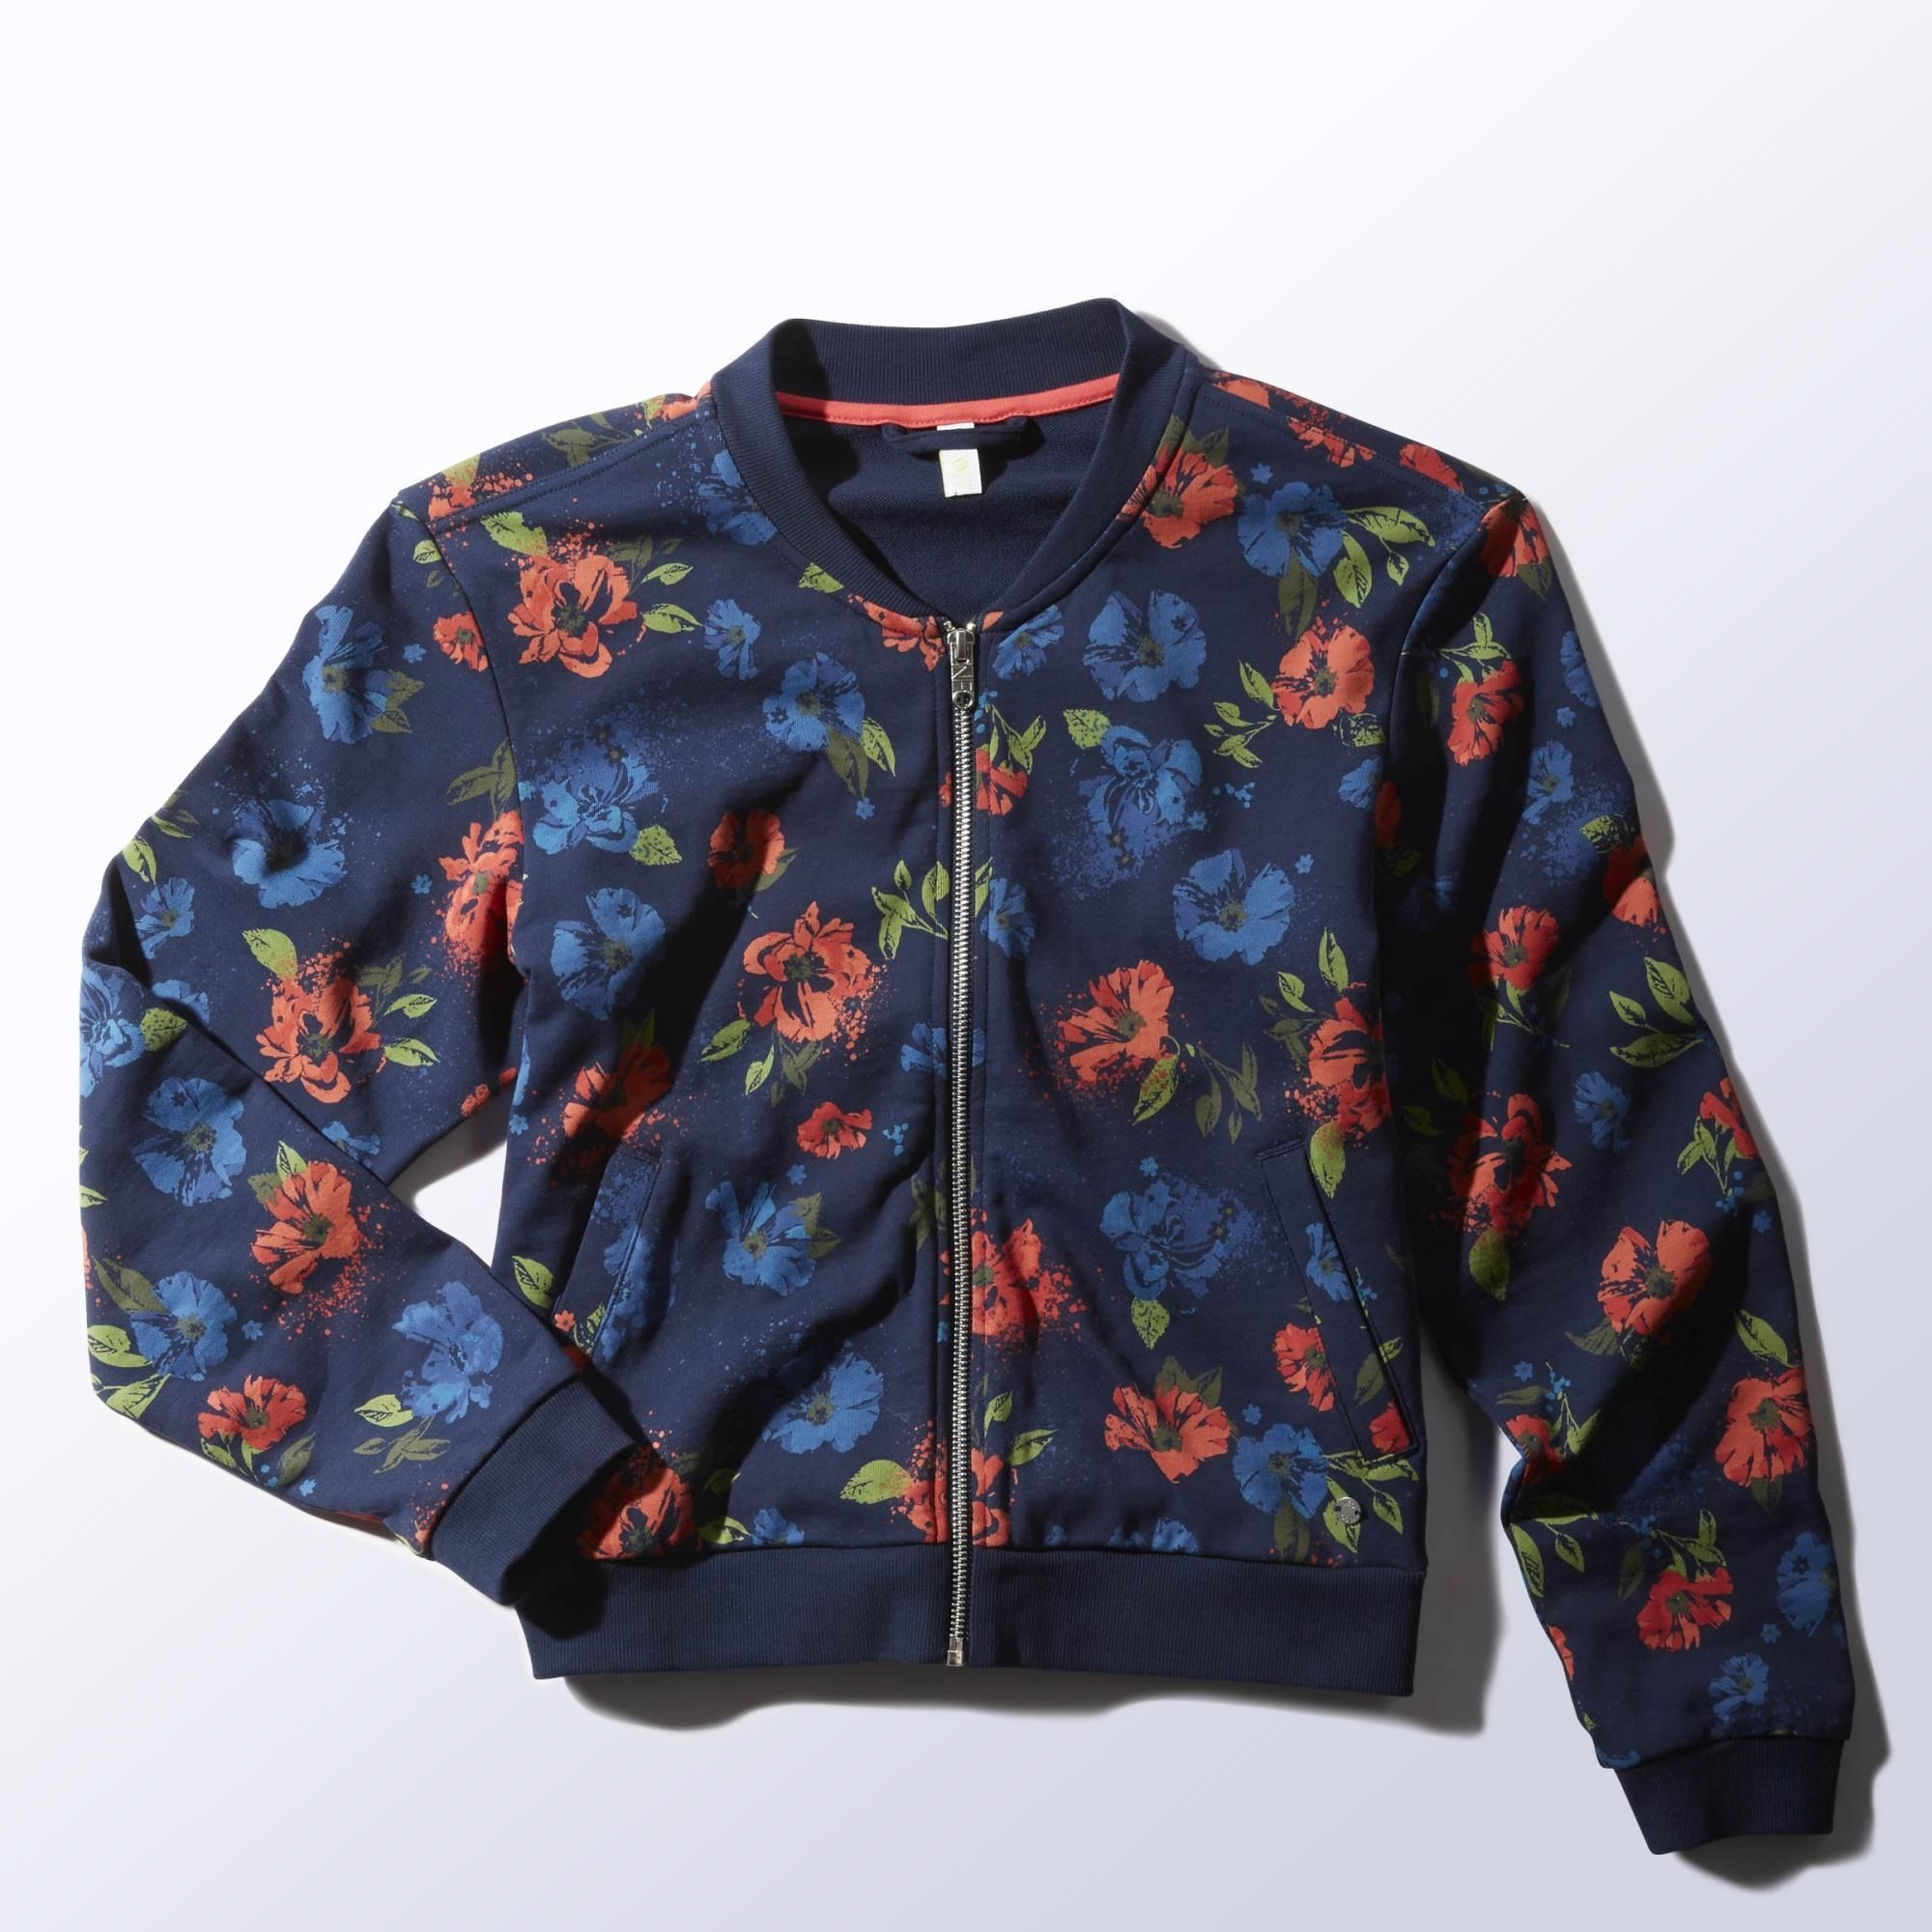 Lada Maestro Narabar  adidas - Floral Bomber Jacket